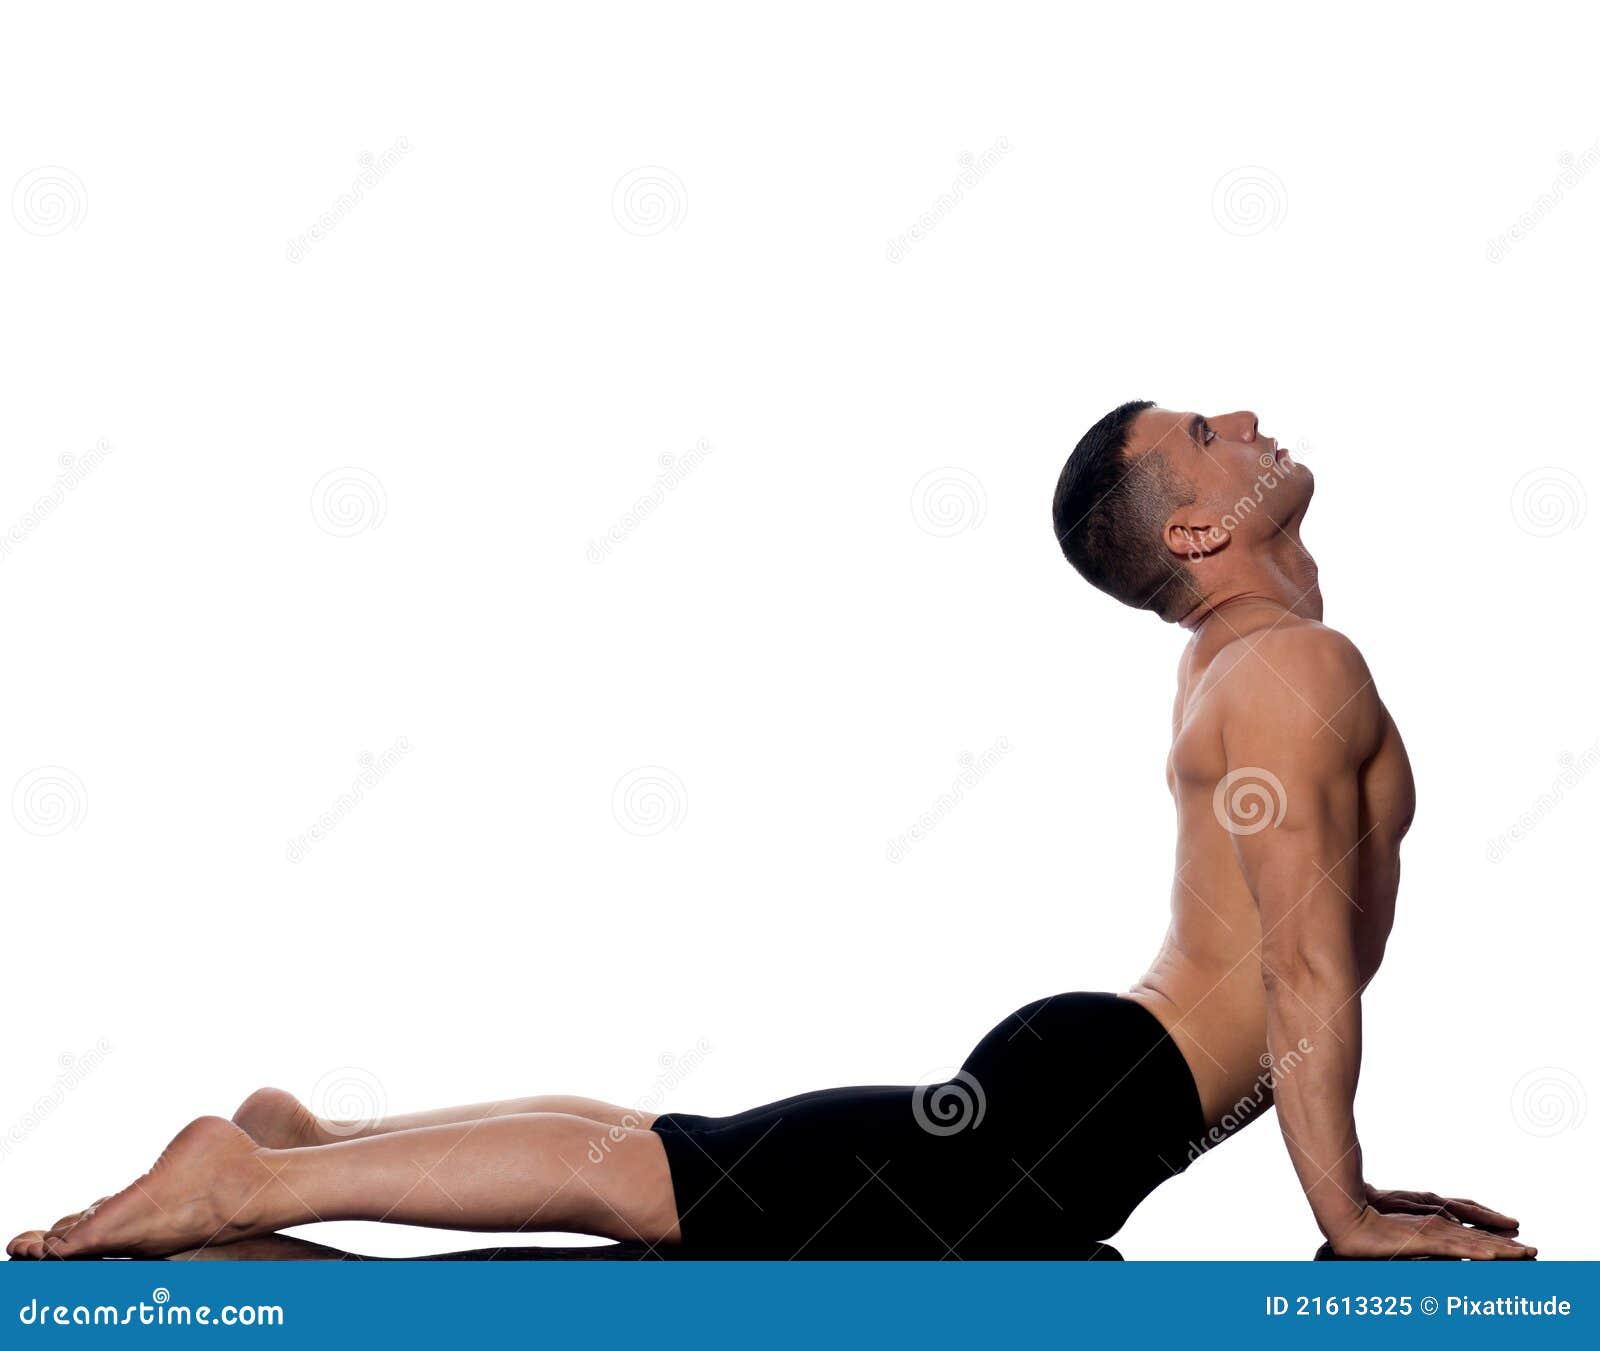 Download Man Yoga Cobra Pose Sun Salutation Surya Namaskar Stock Image